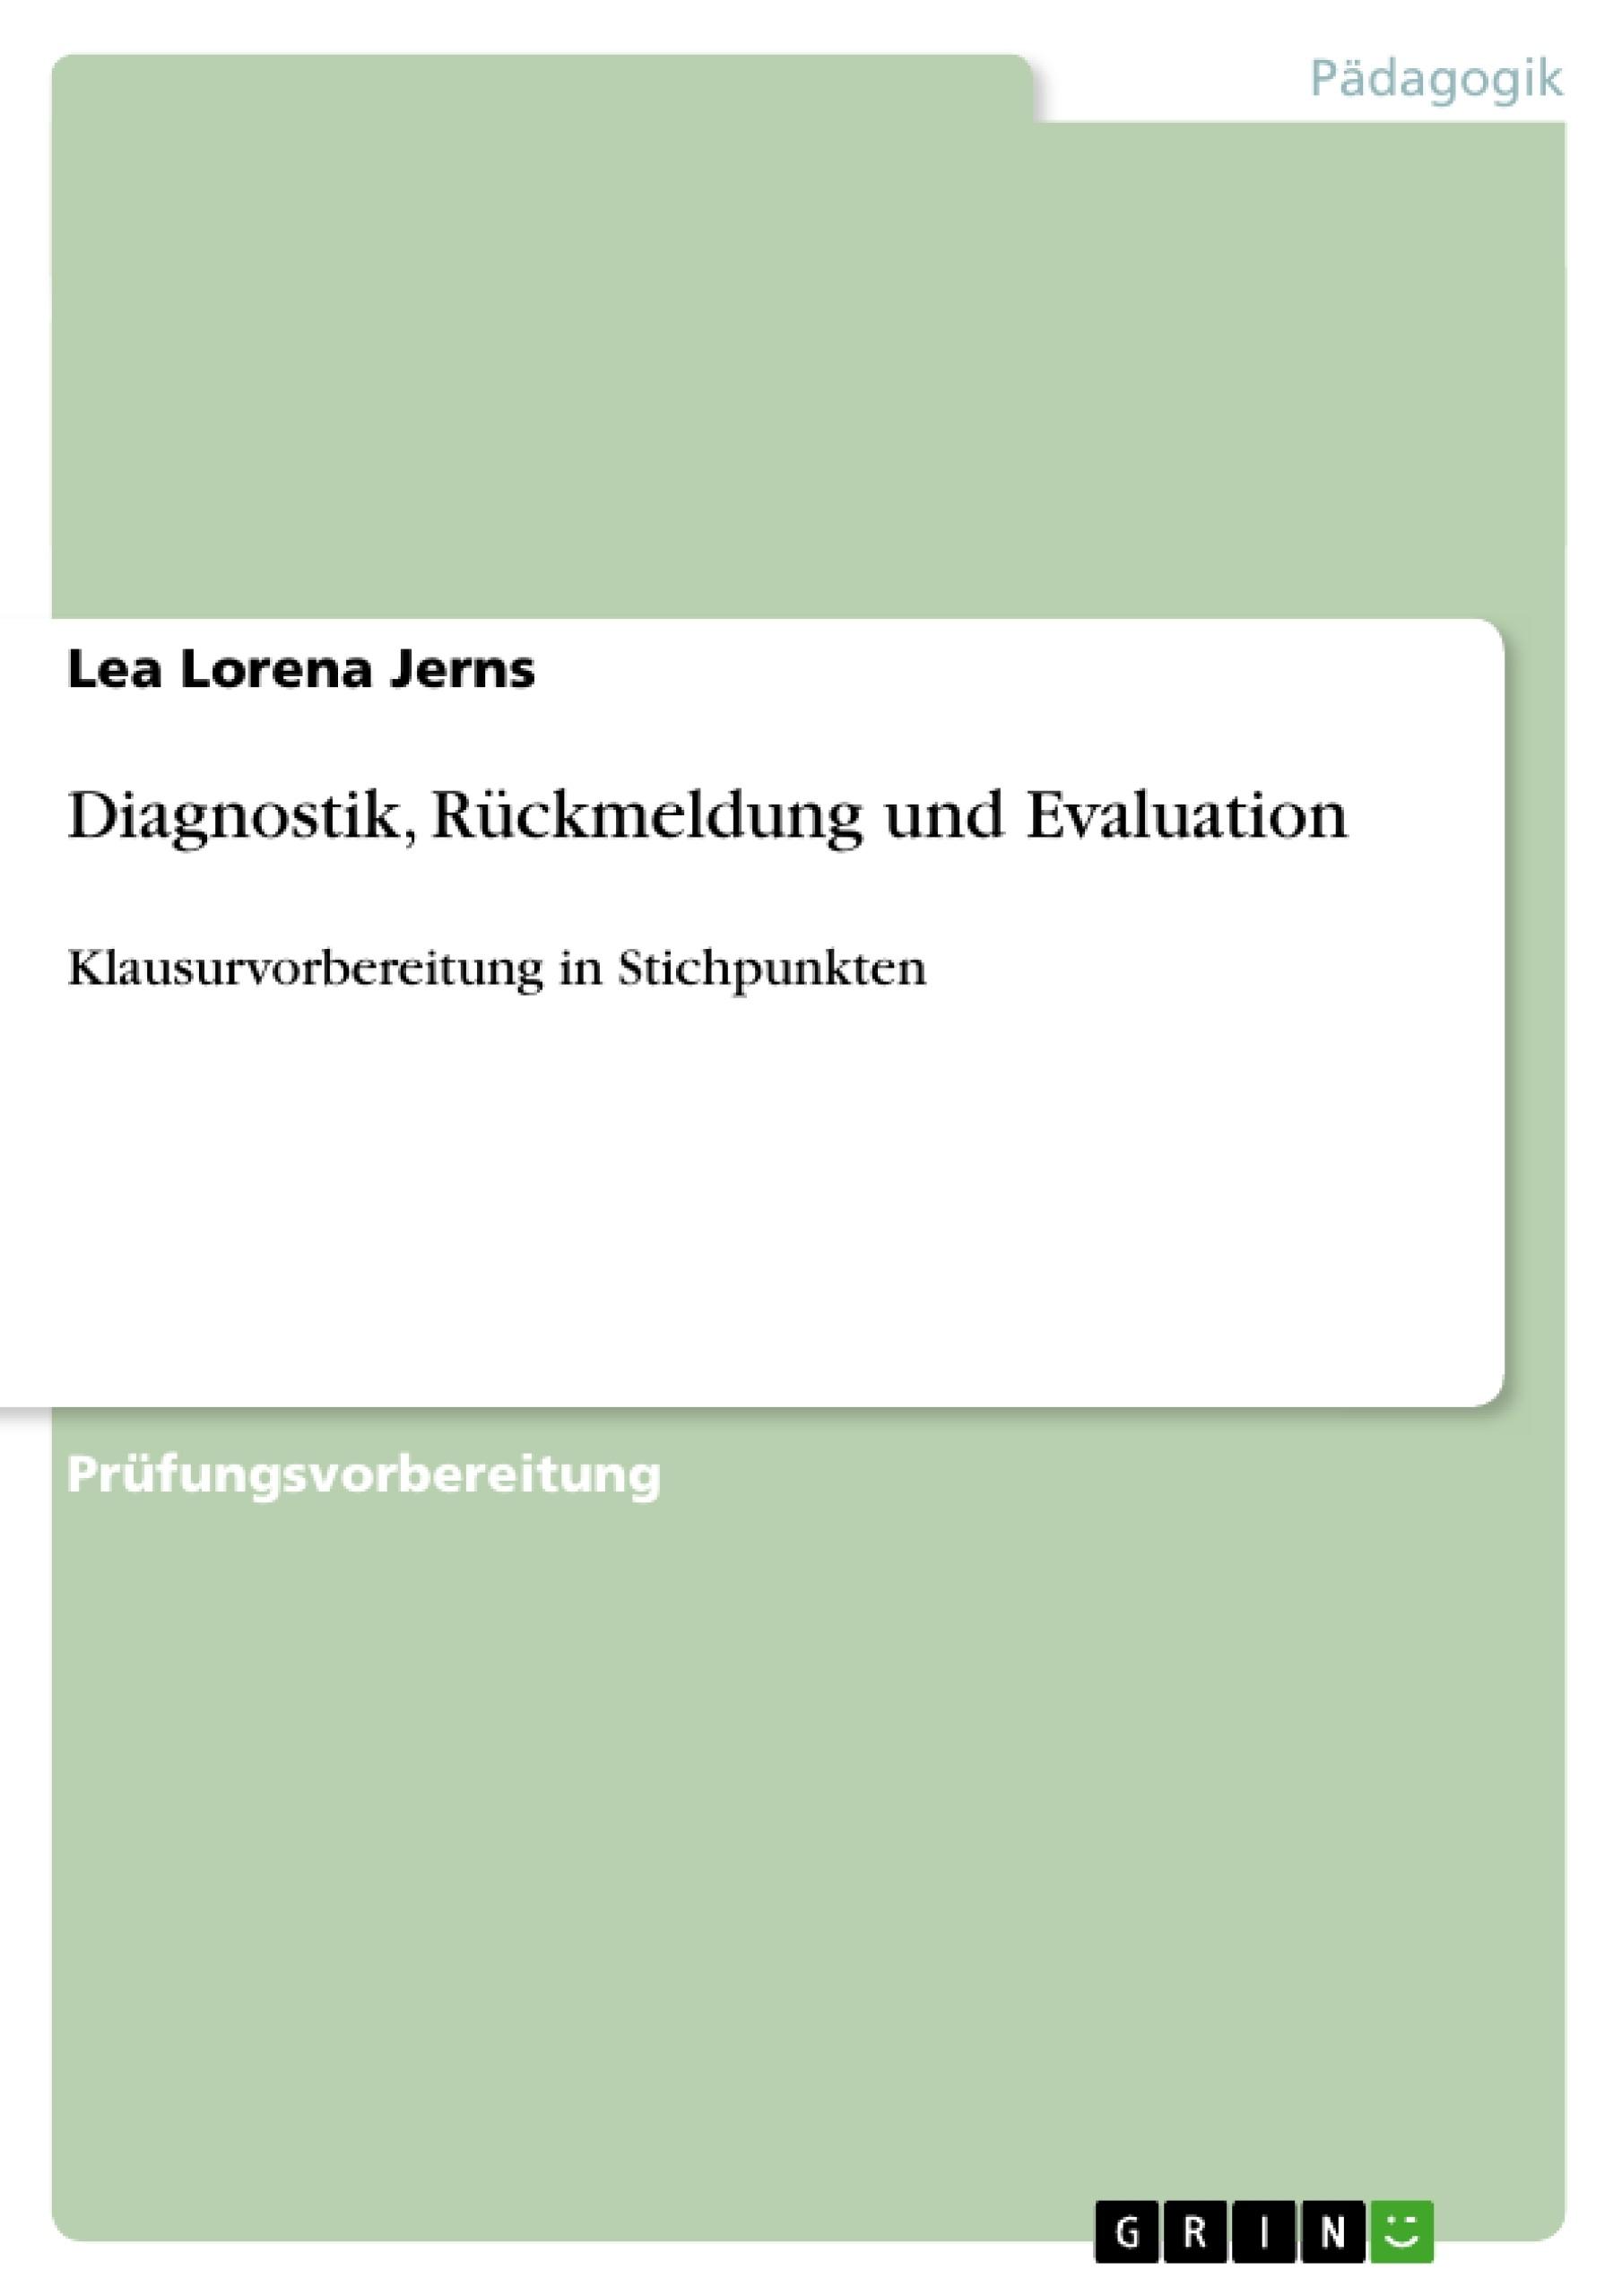 Titel: Diagnostik, Rückmeldung und Evaluation